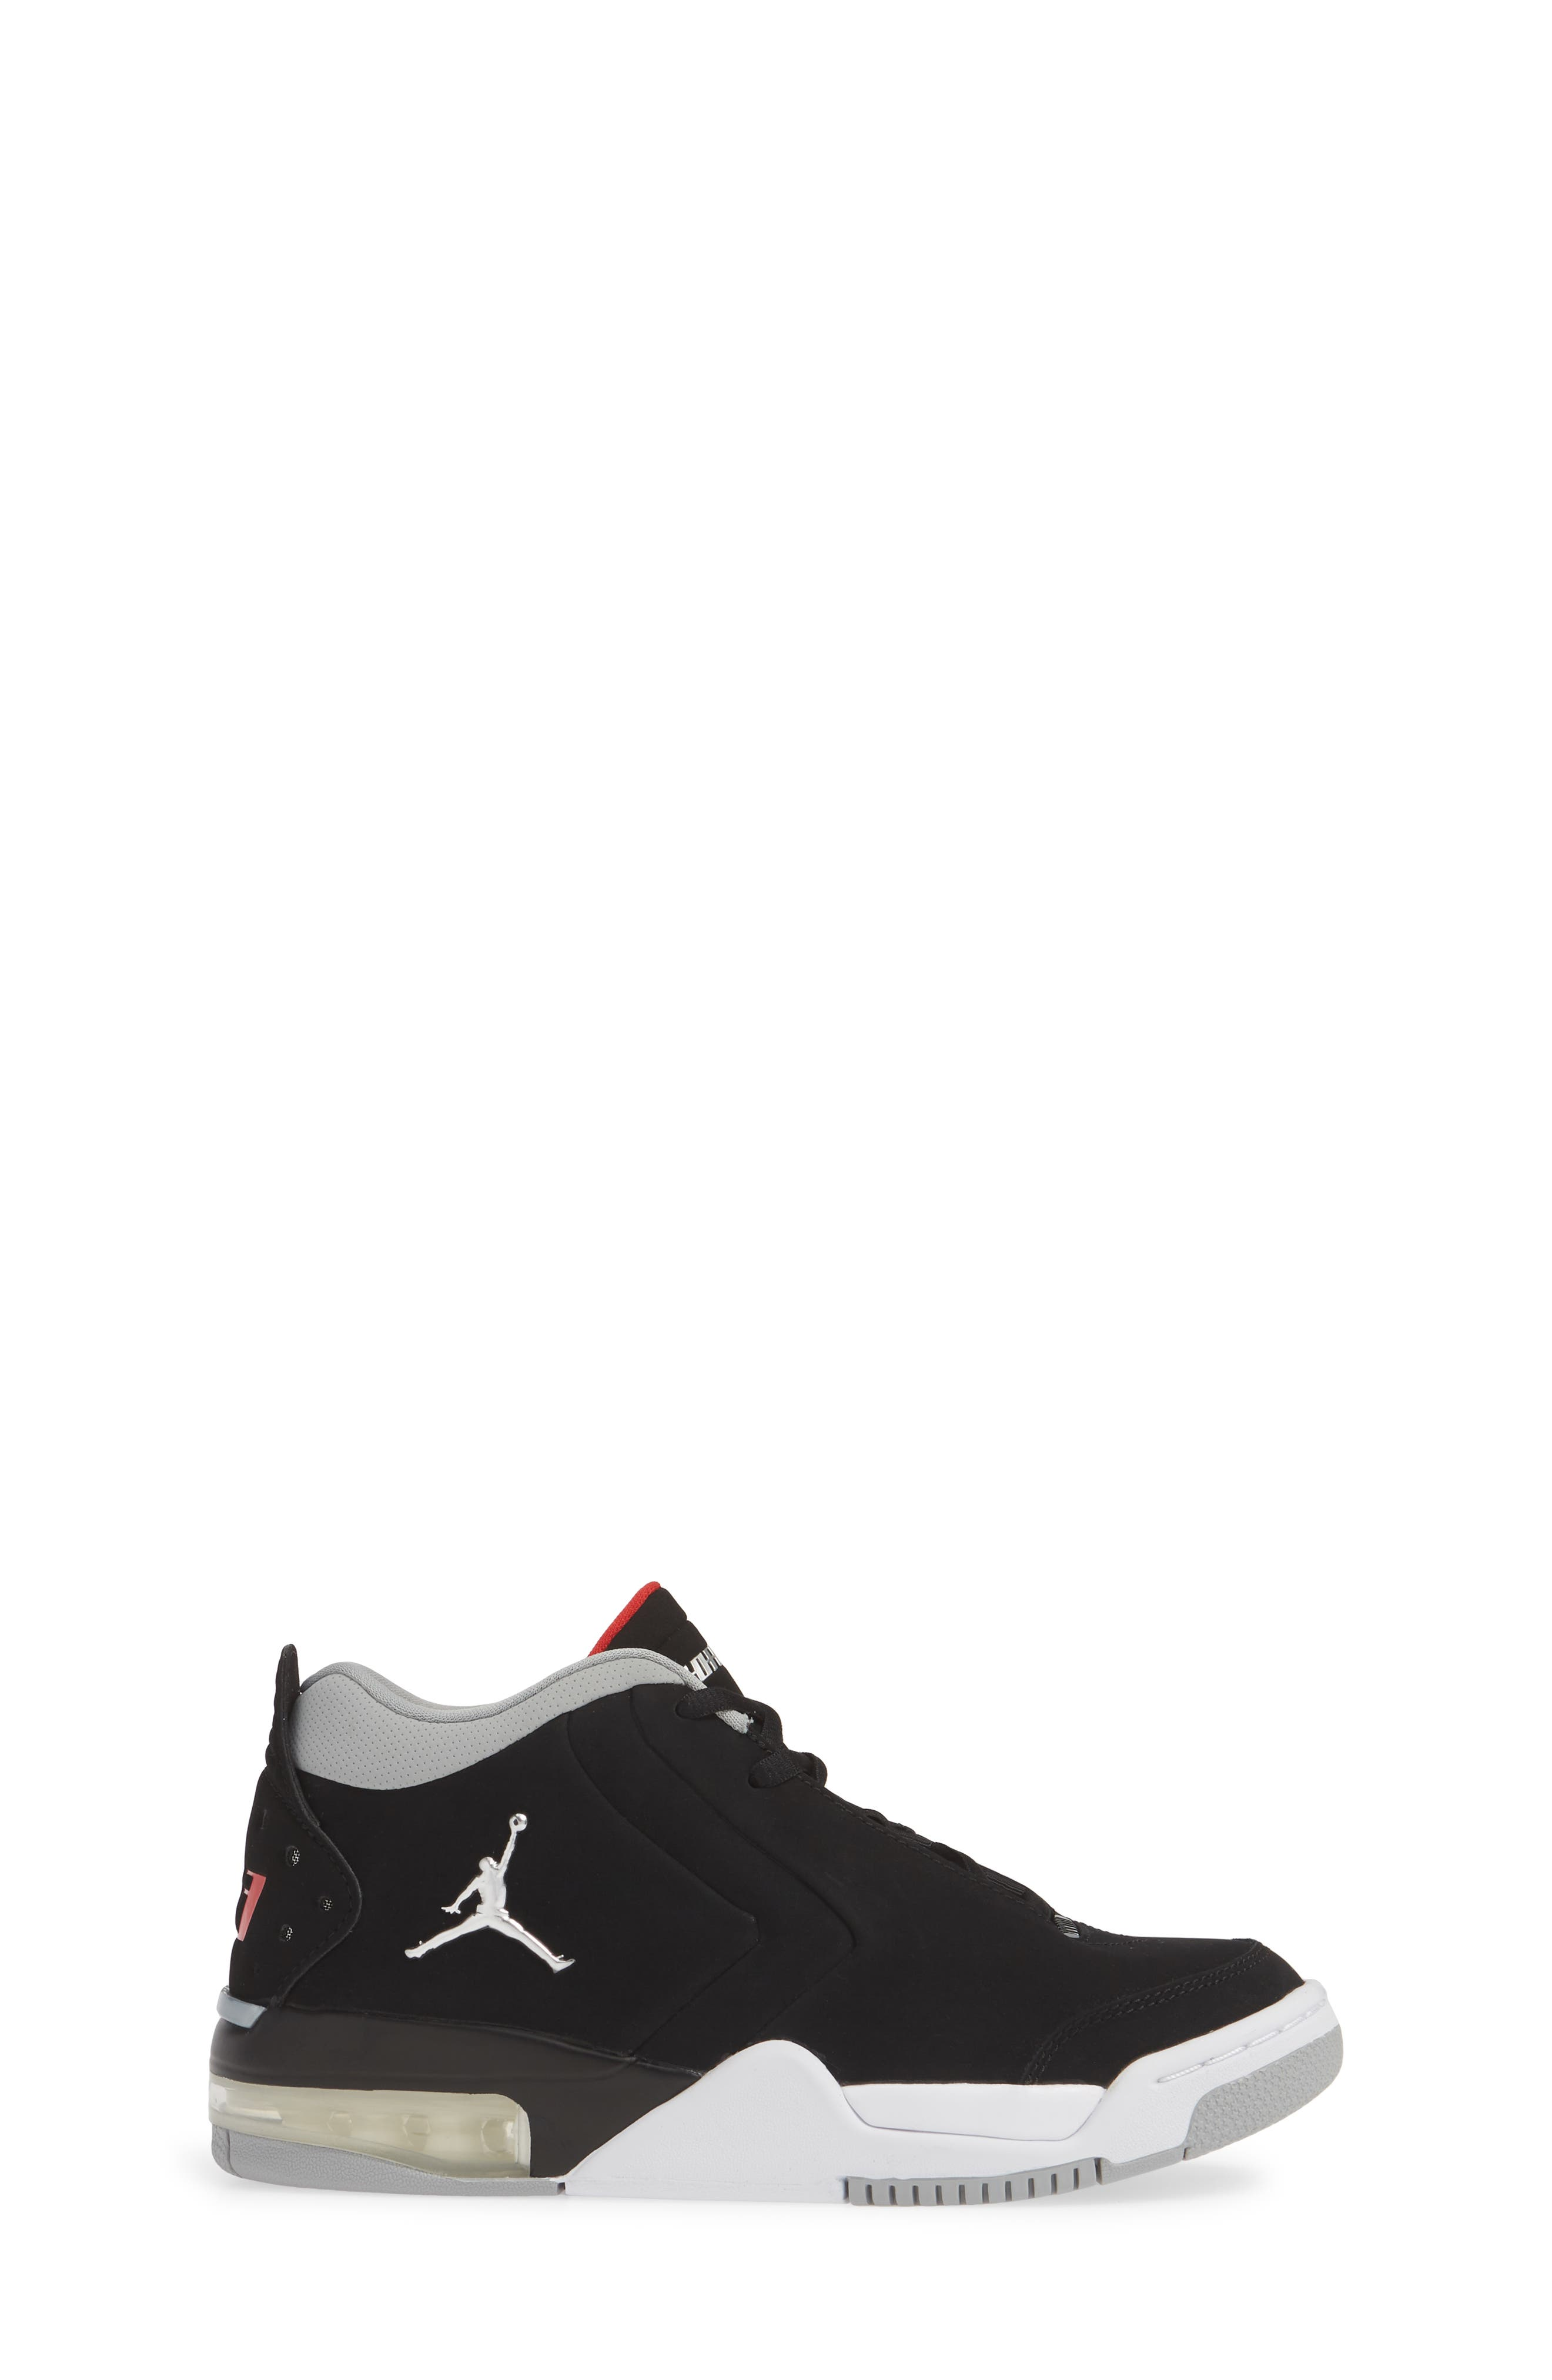 JORDAN, Big Fund Mid Top Basketball Sneaker, Alternate thumbnail 3, color, BLACK/ METALLIC SILVER-WHITE